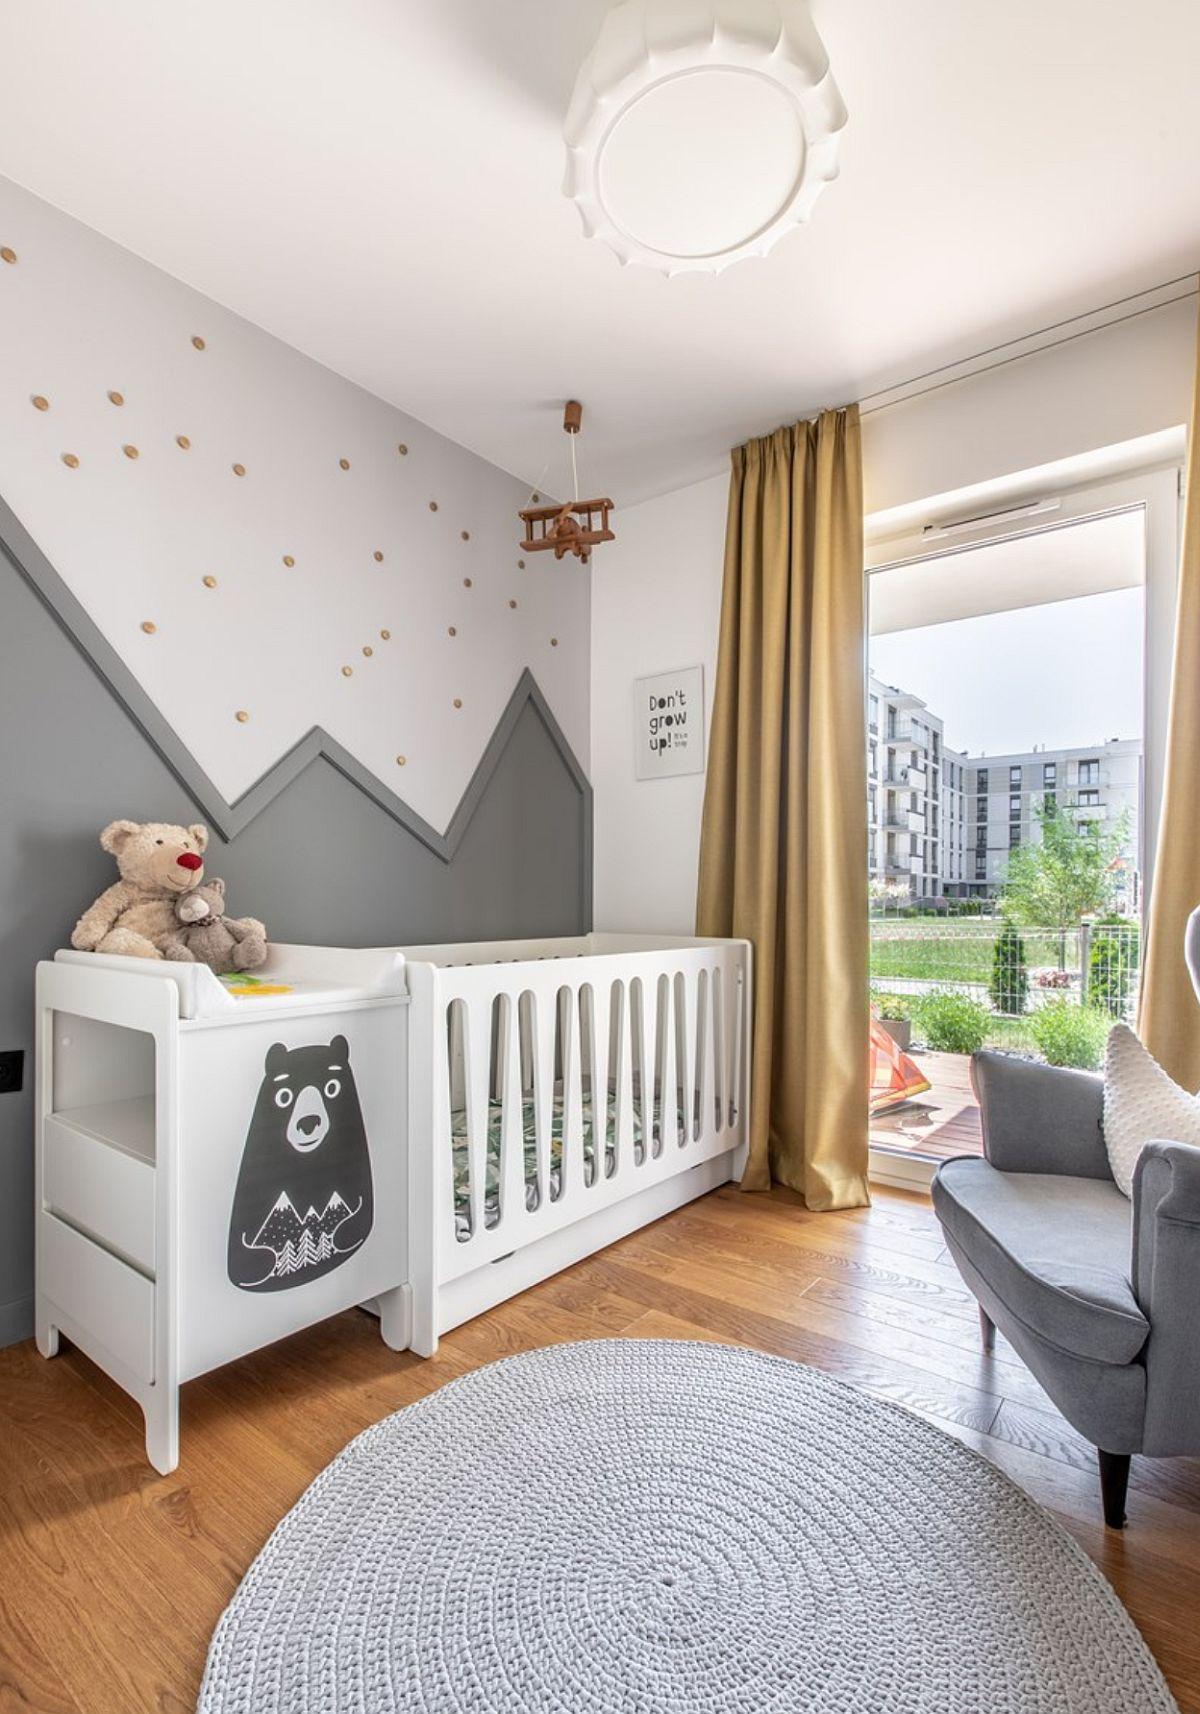 adelaparvu.com despre locuinta 36 mp, design Soft Loft, Foto Magda si Piotr Motrenko (3)